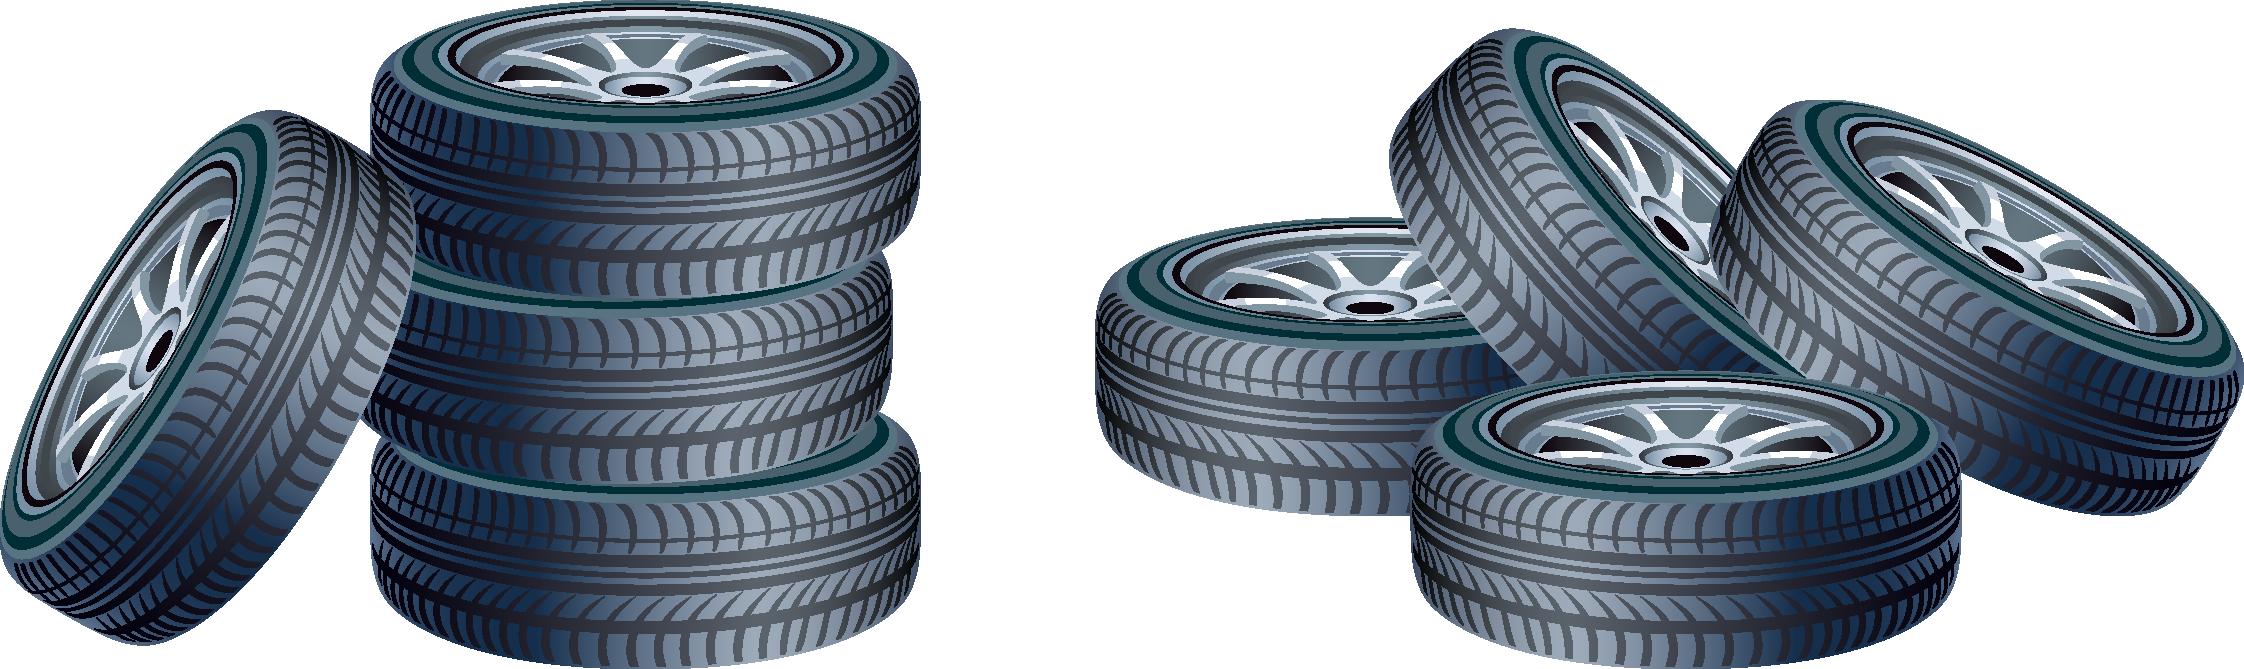 Car clip art tires. Wheel clipart spare tire